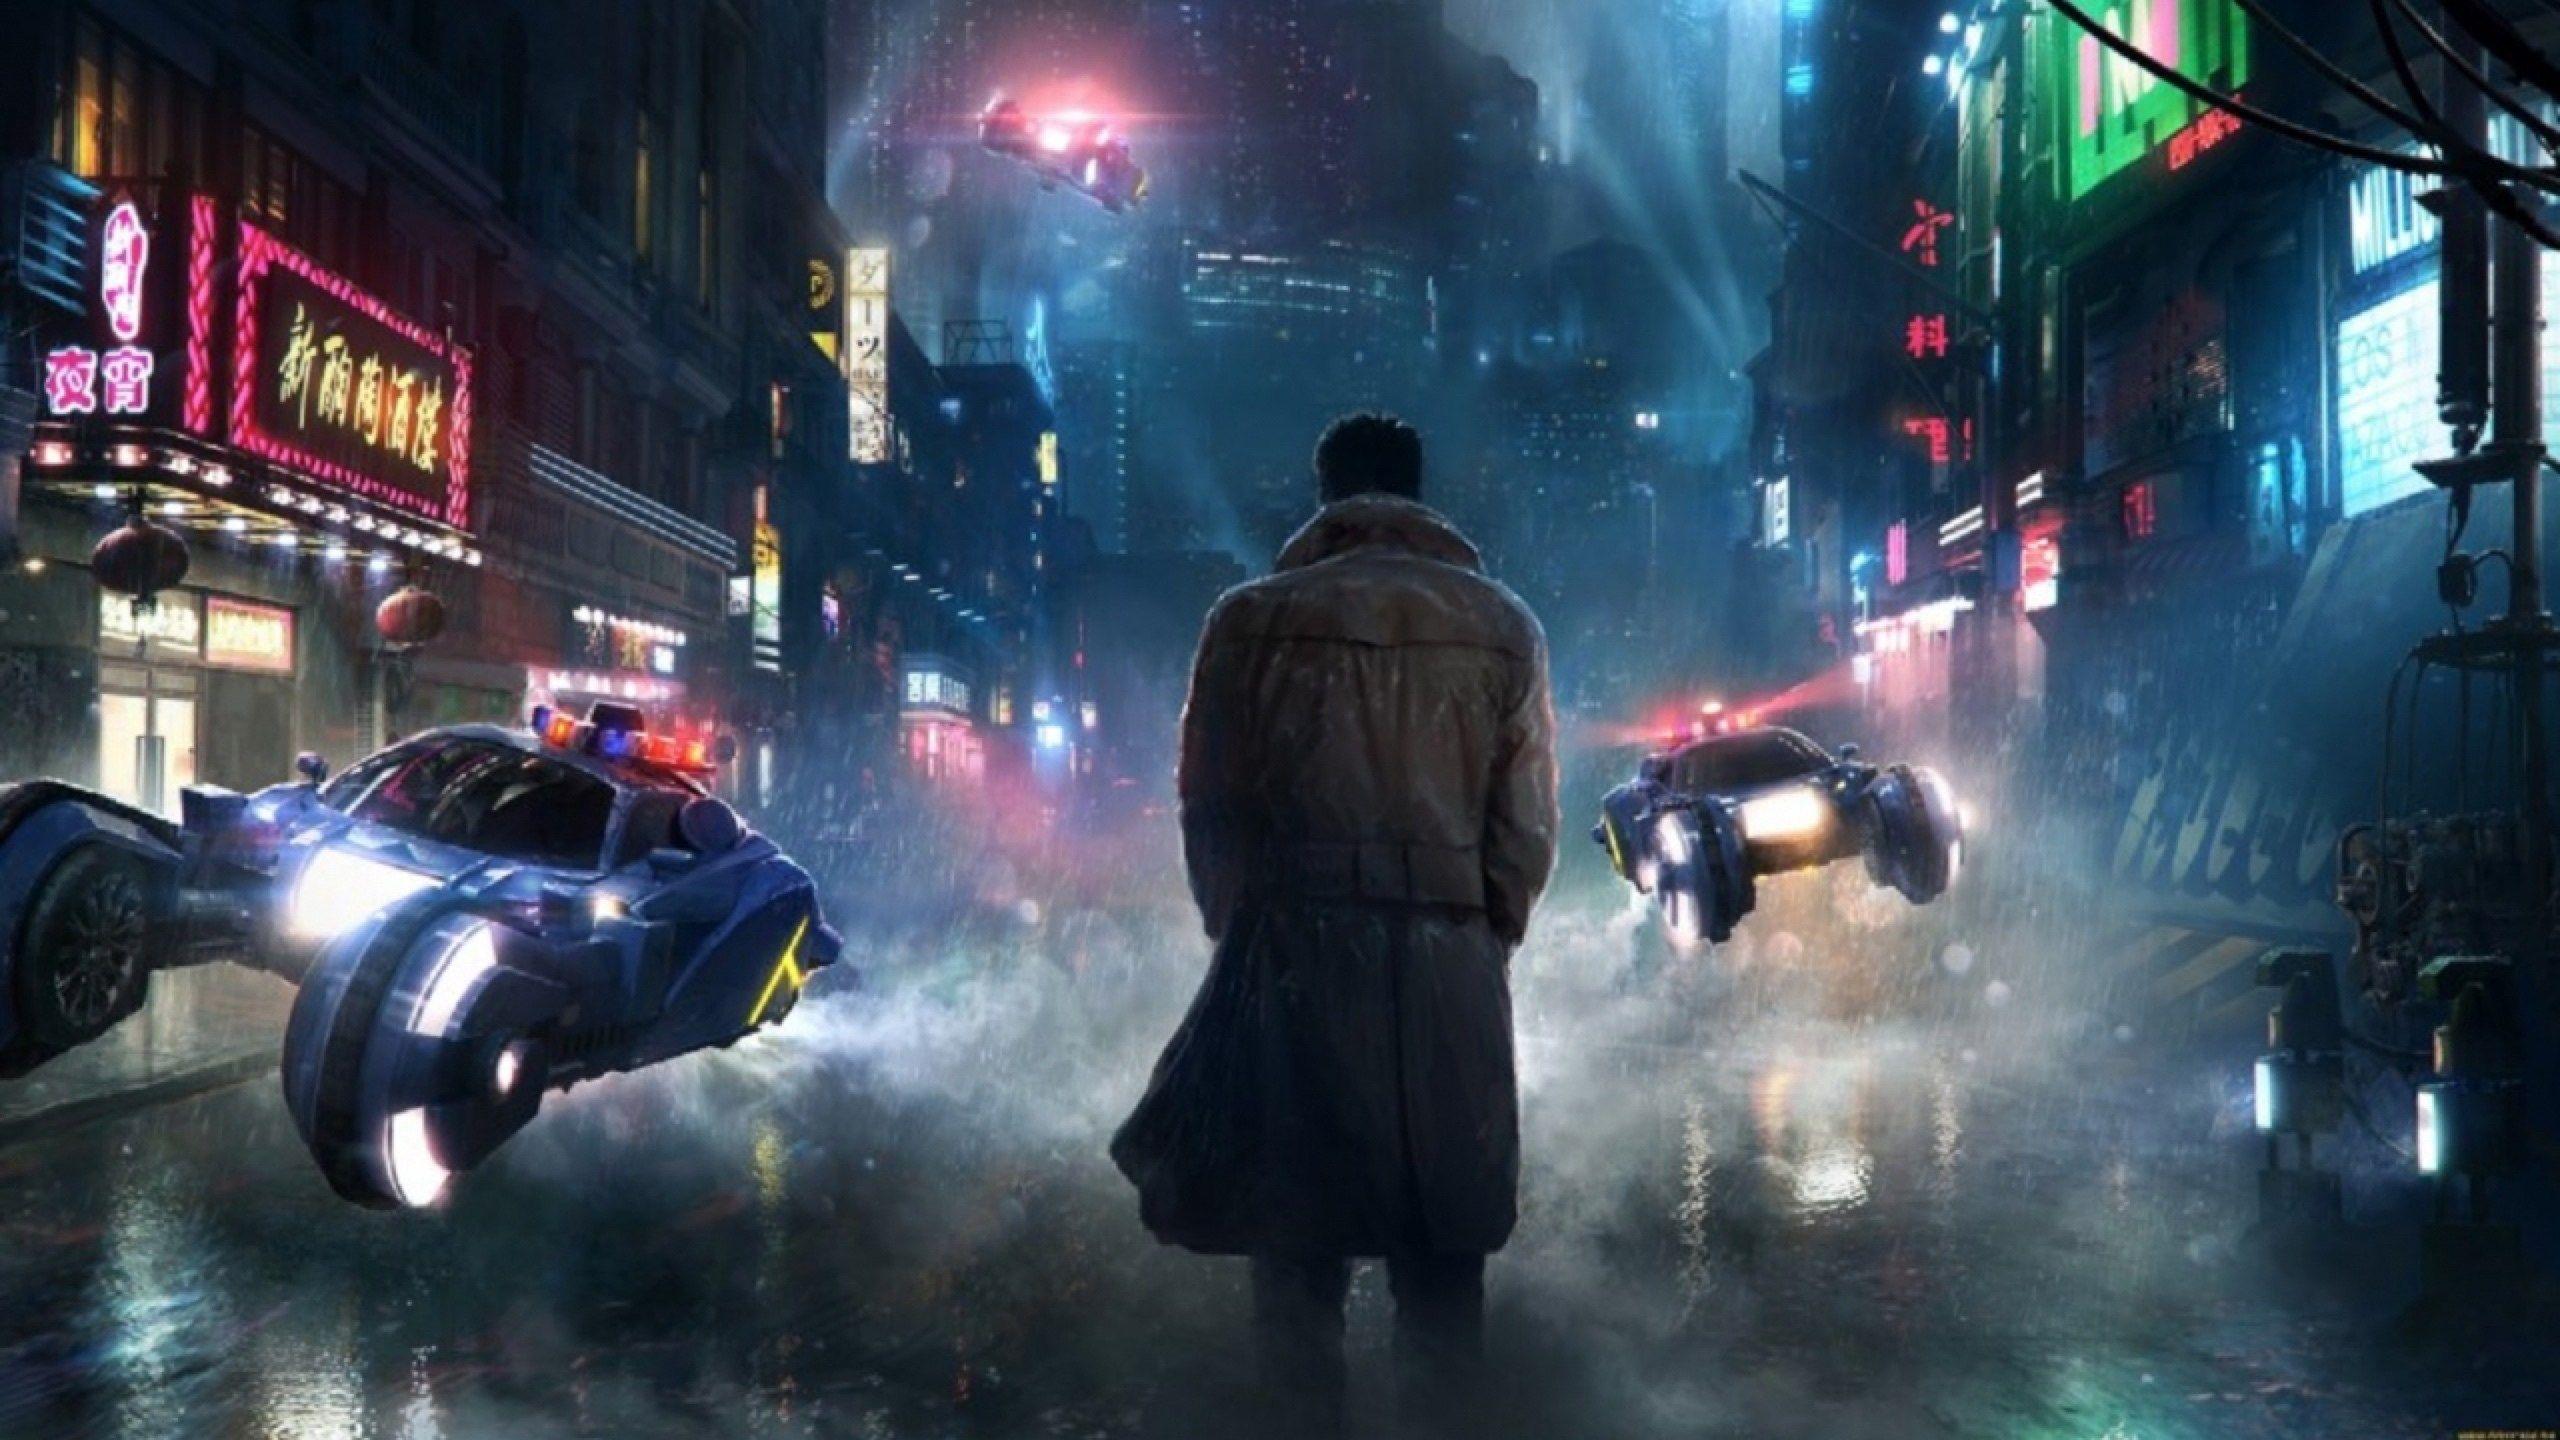 """Blade Runner 2049"": Avance del nuevo tráiler que veremos mañana"